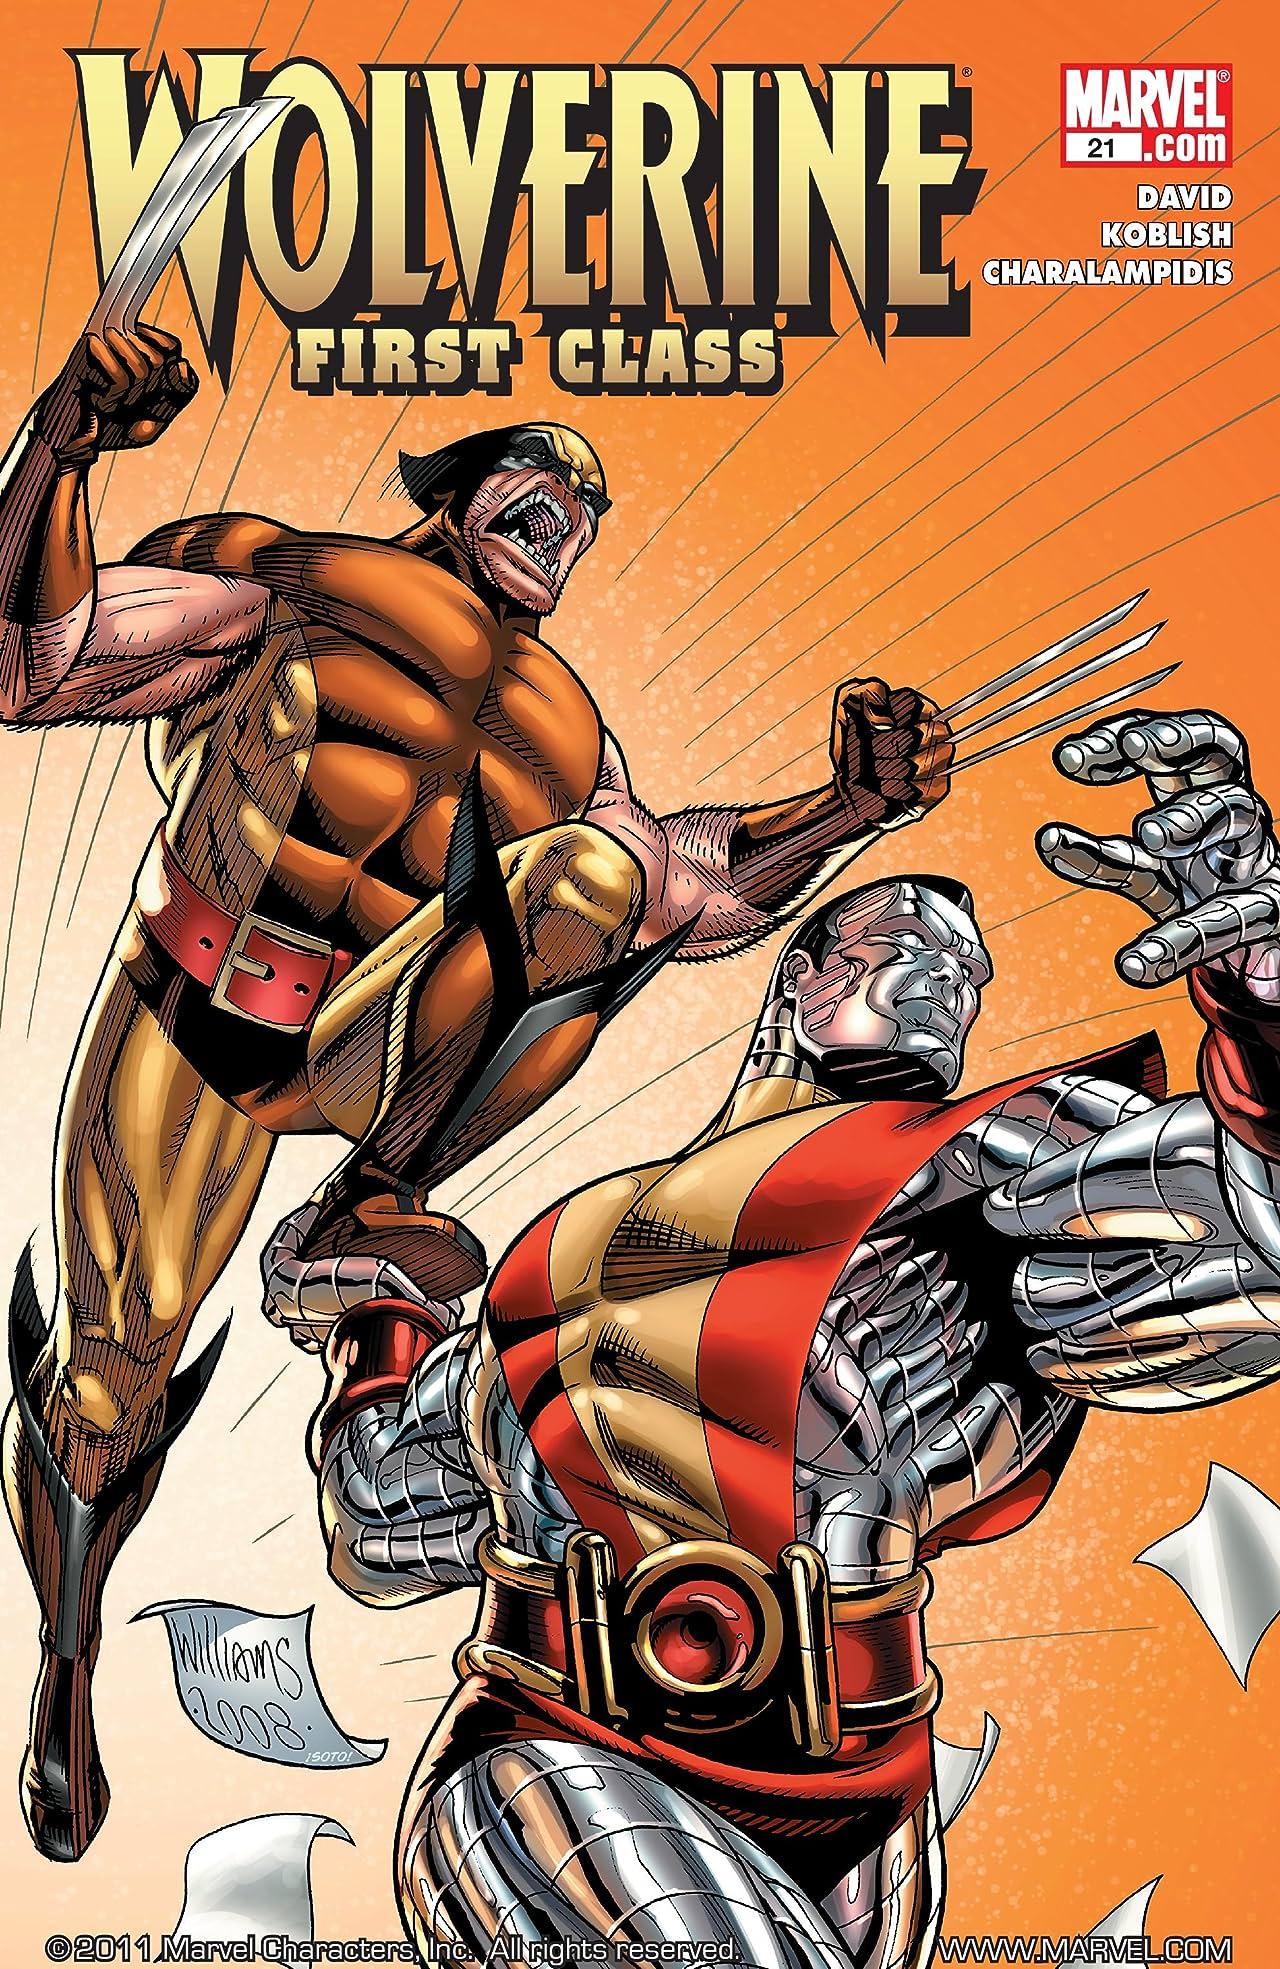 Wolverine: First Class #21